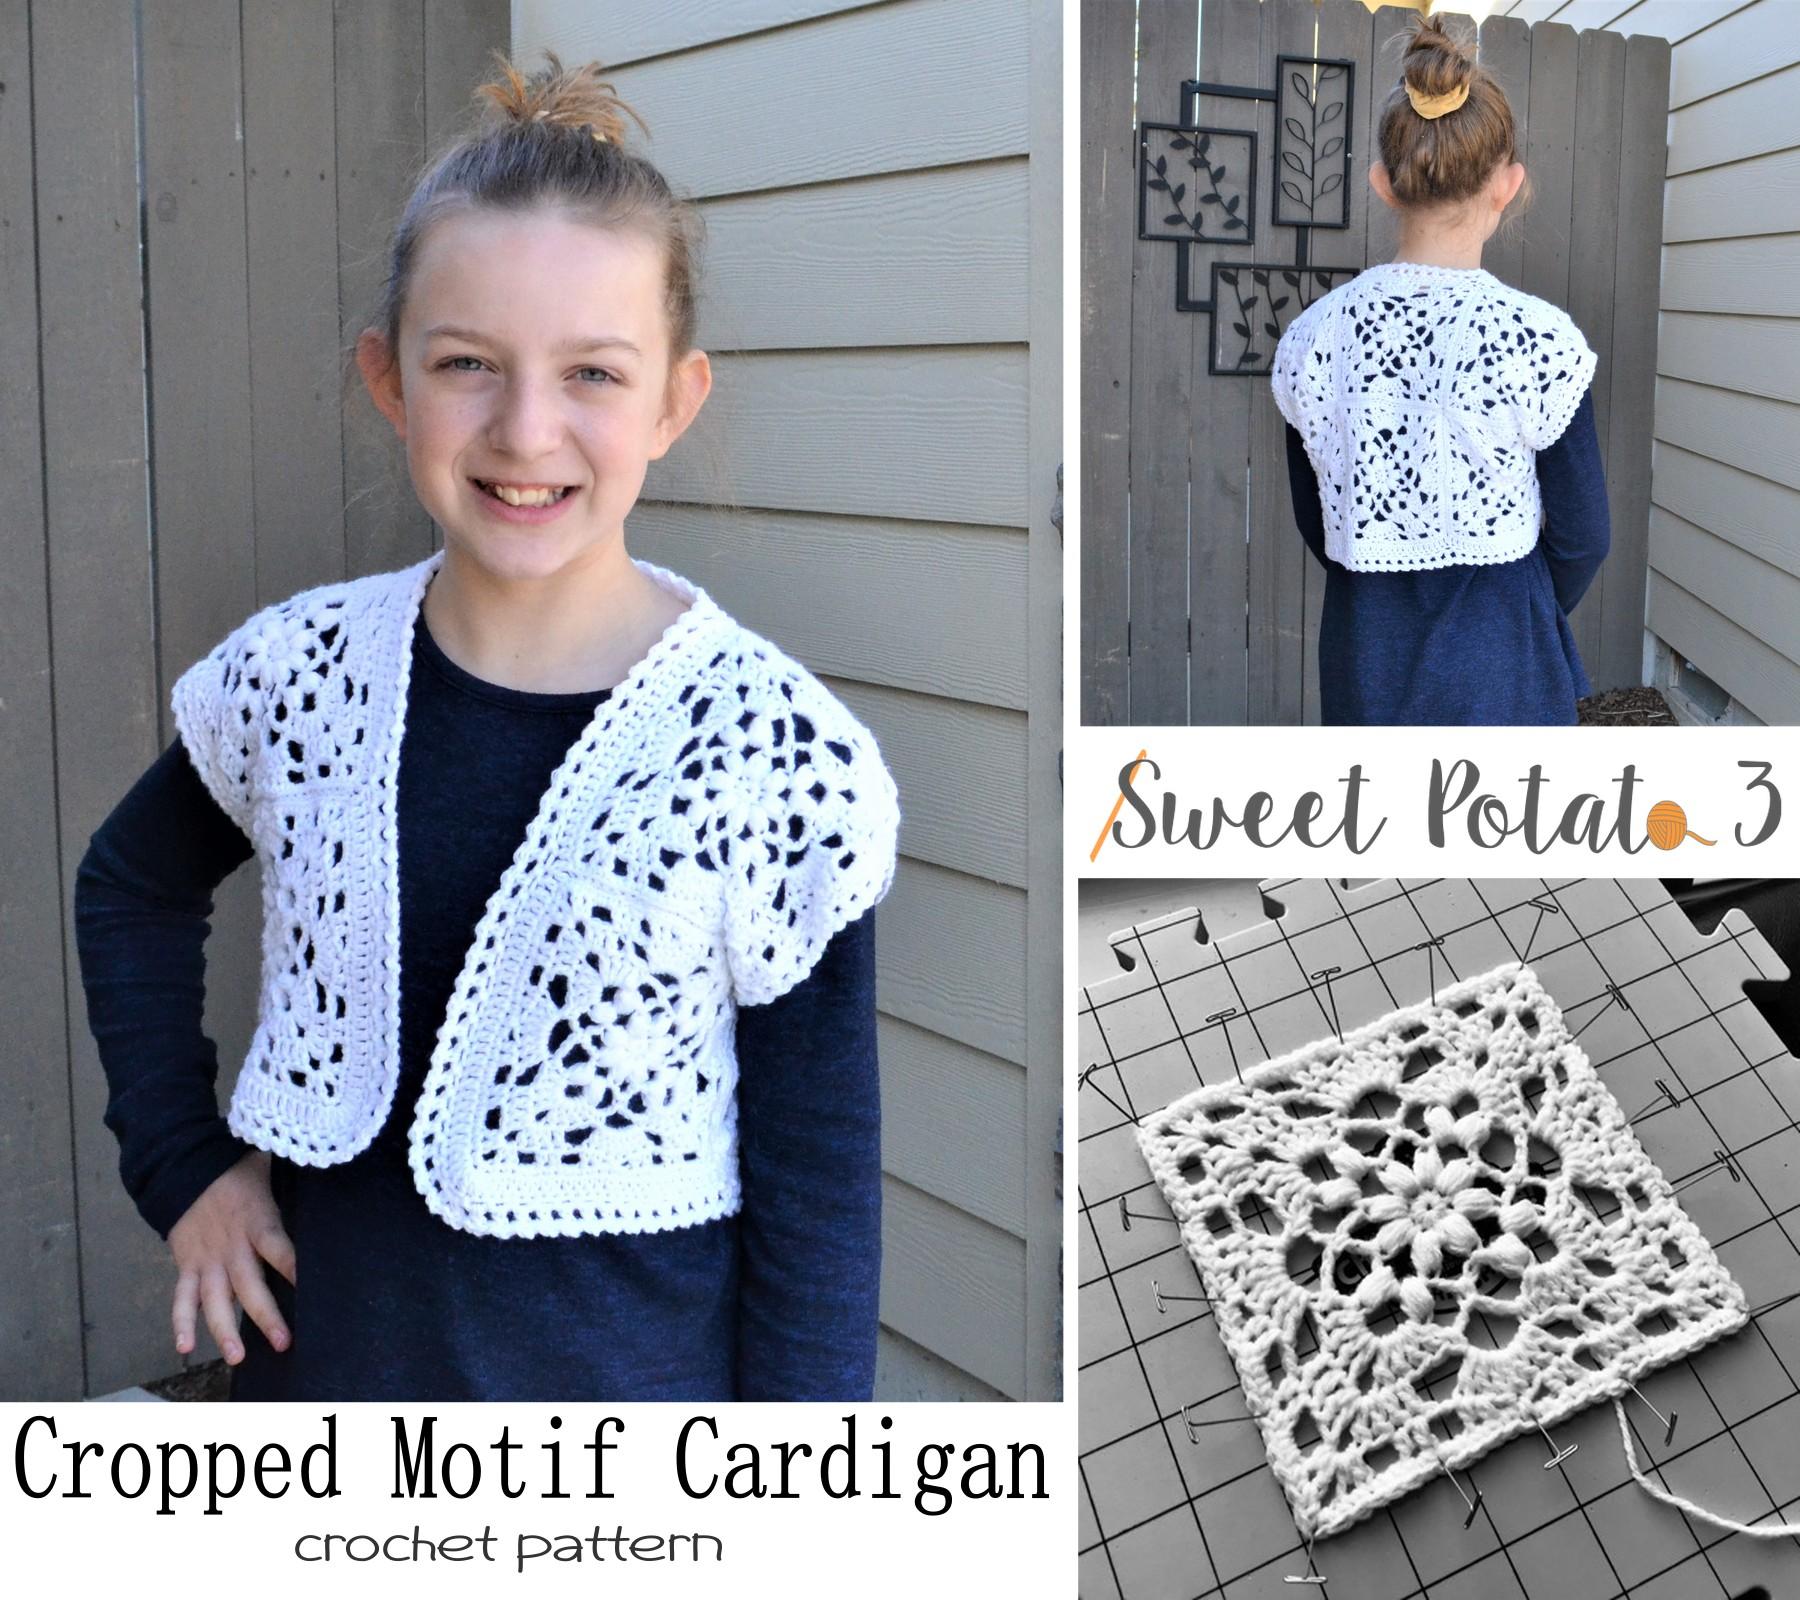 Cropped Motif Cardigan – Crochet Pattern